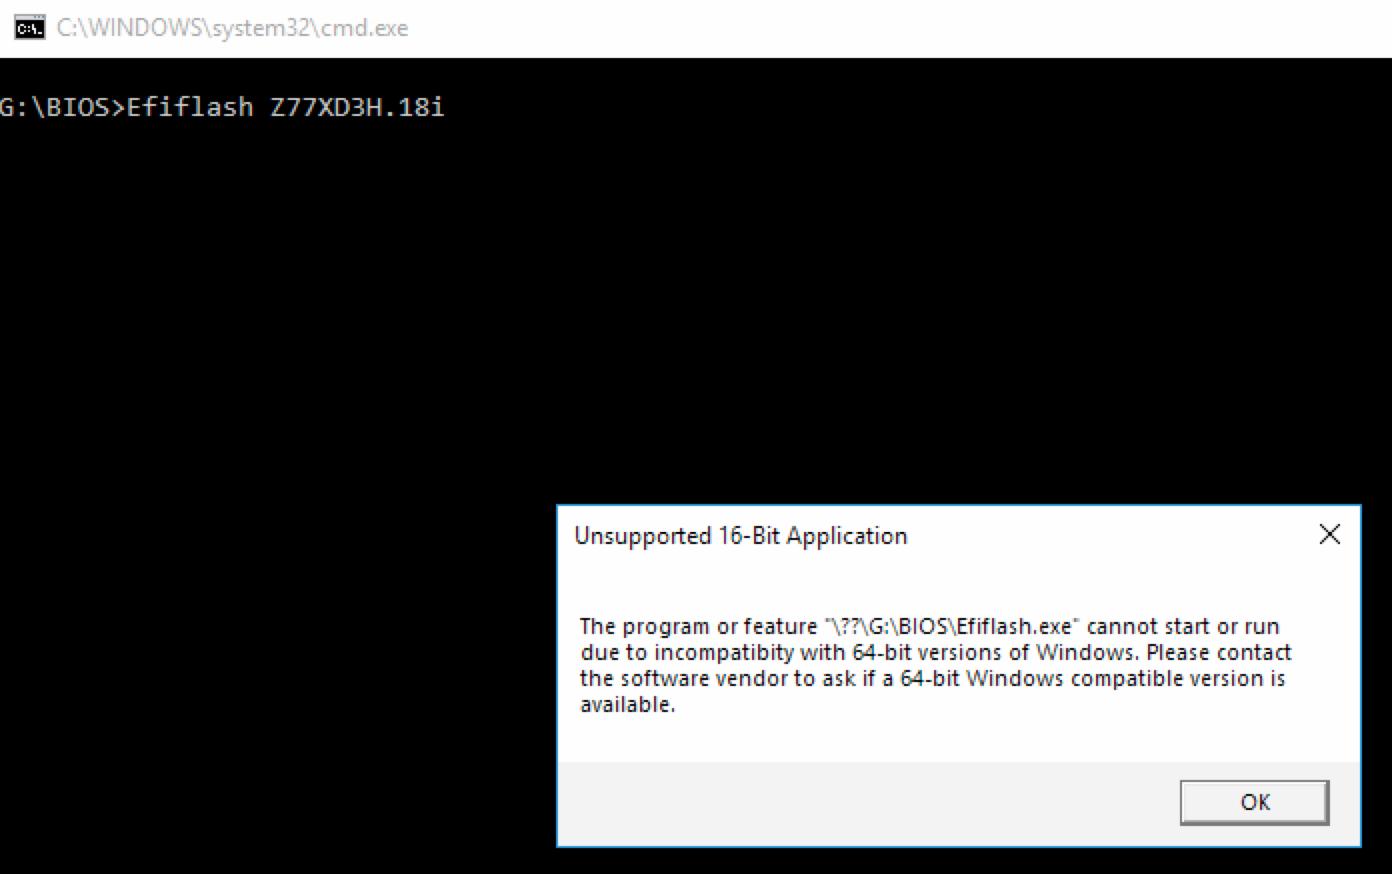 Asus Nvidia GeForce GTX 1060 (6GB) GPU - Windows has stopped